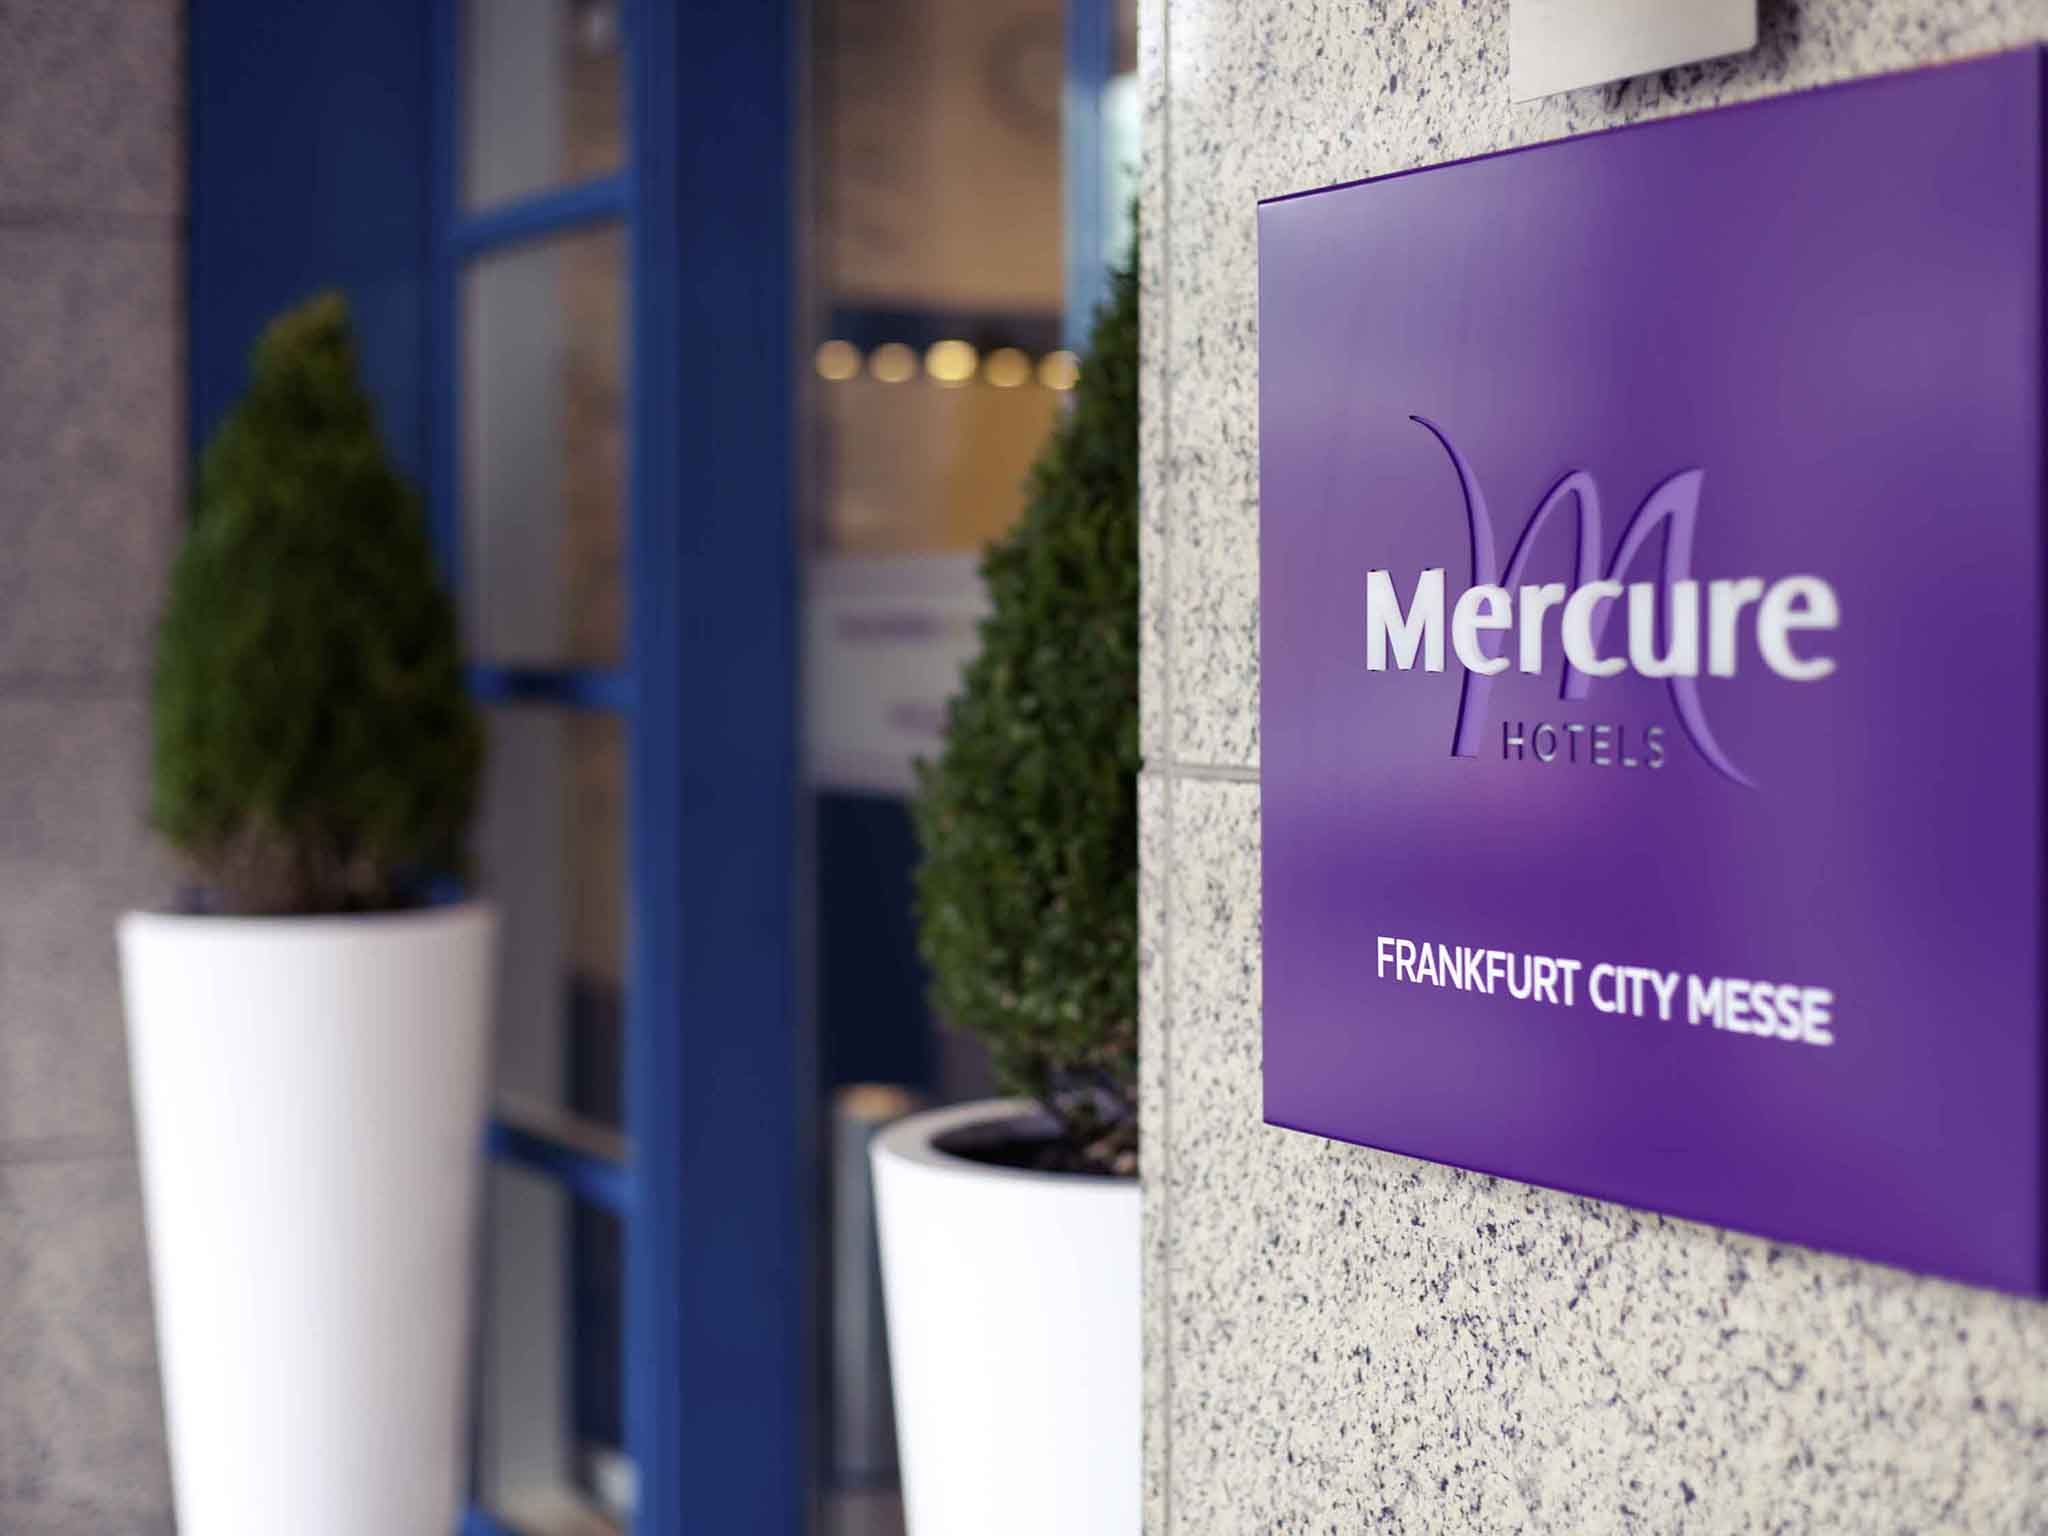 فندق - فندق مركيور Mercure فرانكفورت سيتي ميسي